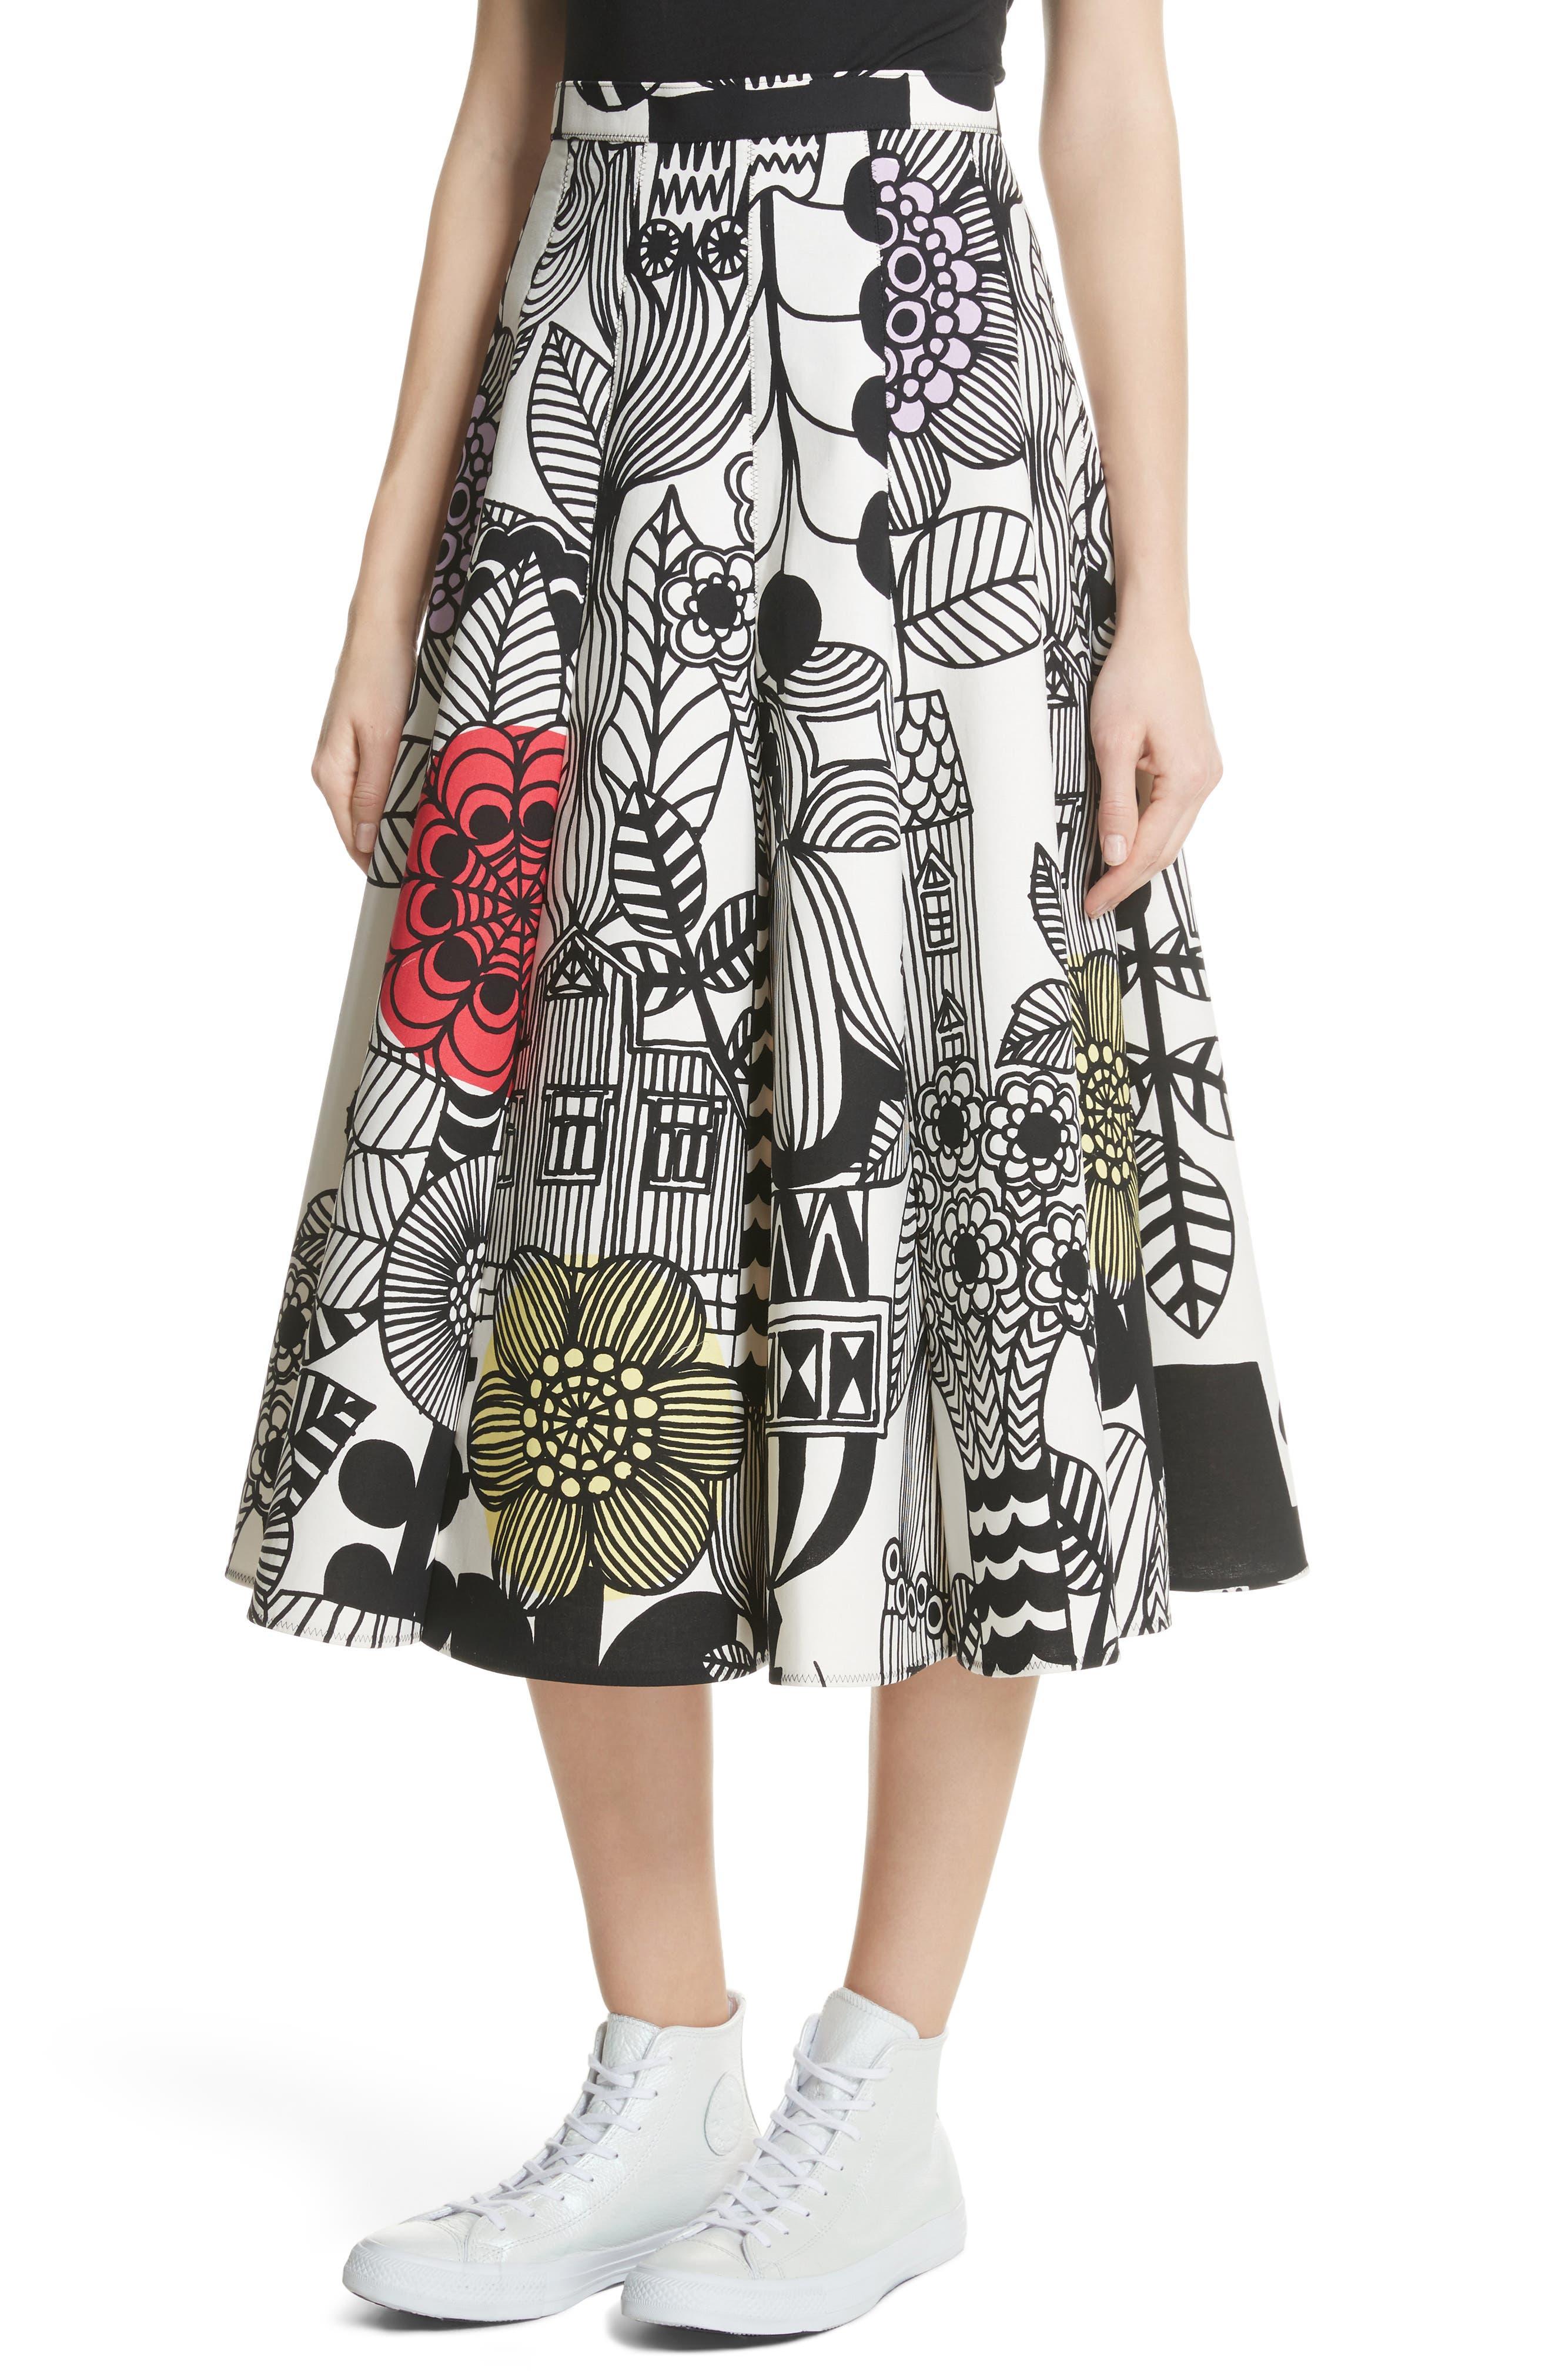 x Marimekko Vegetable Print Cotton Skirt,                             Alternate thumbnail 4, color,                             Wht/ Blk/ Ylw